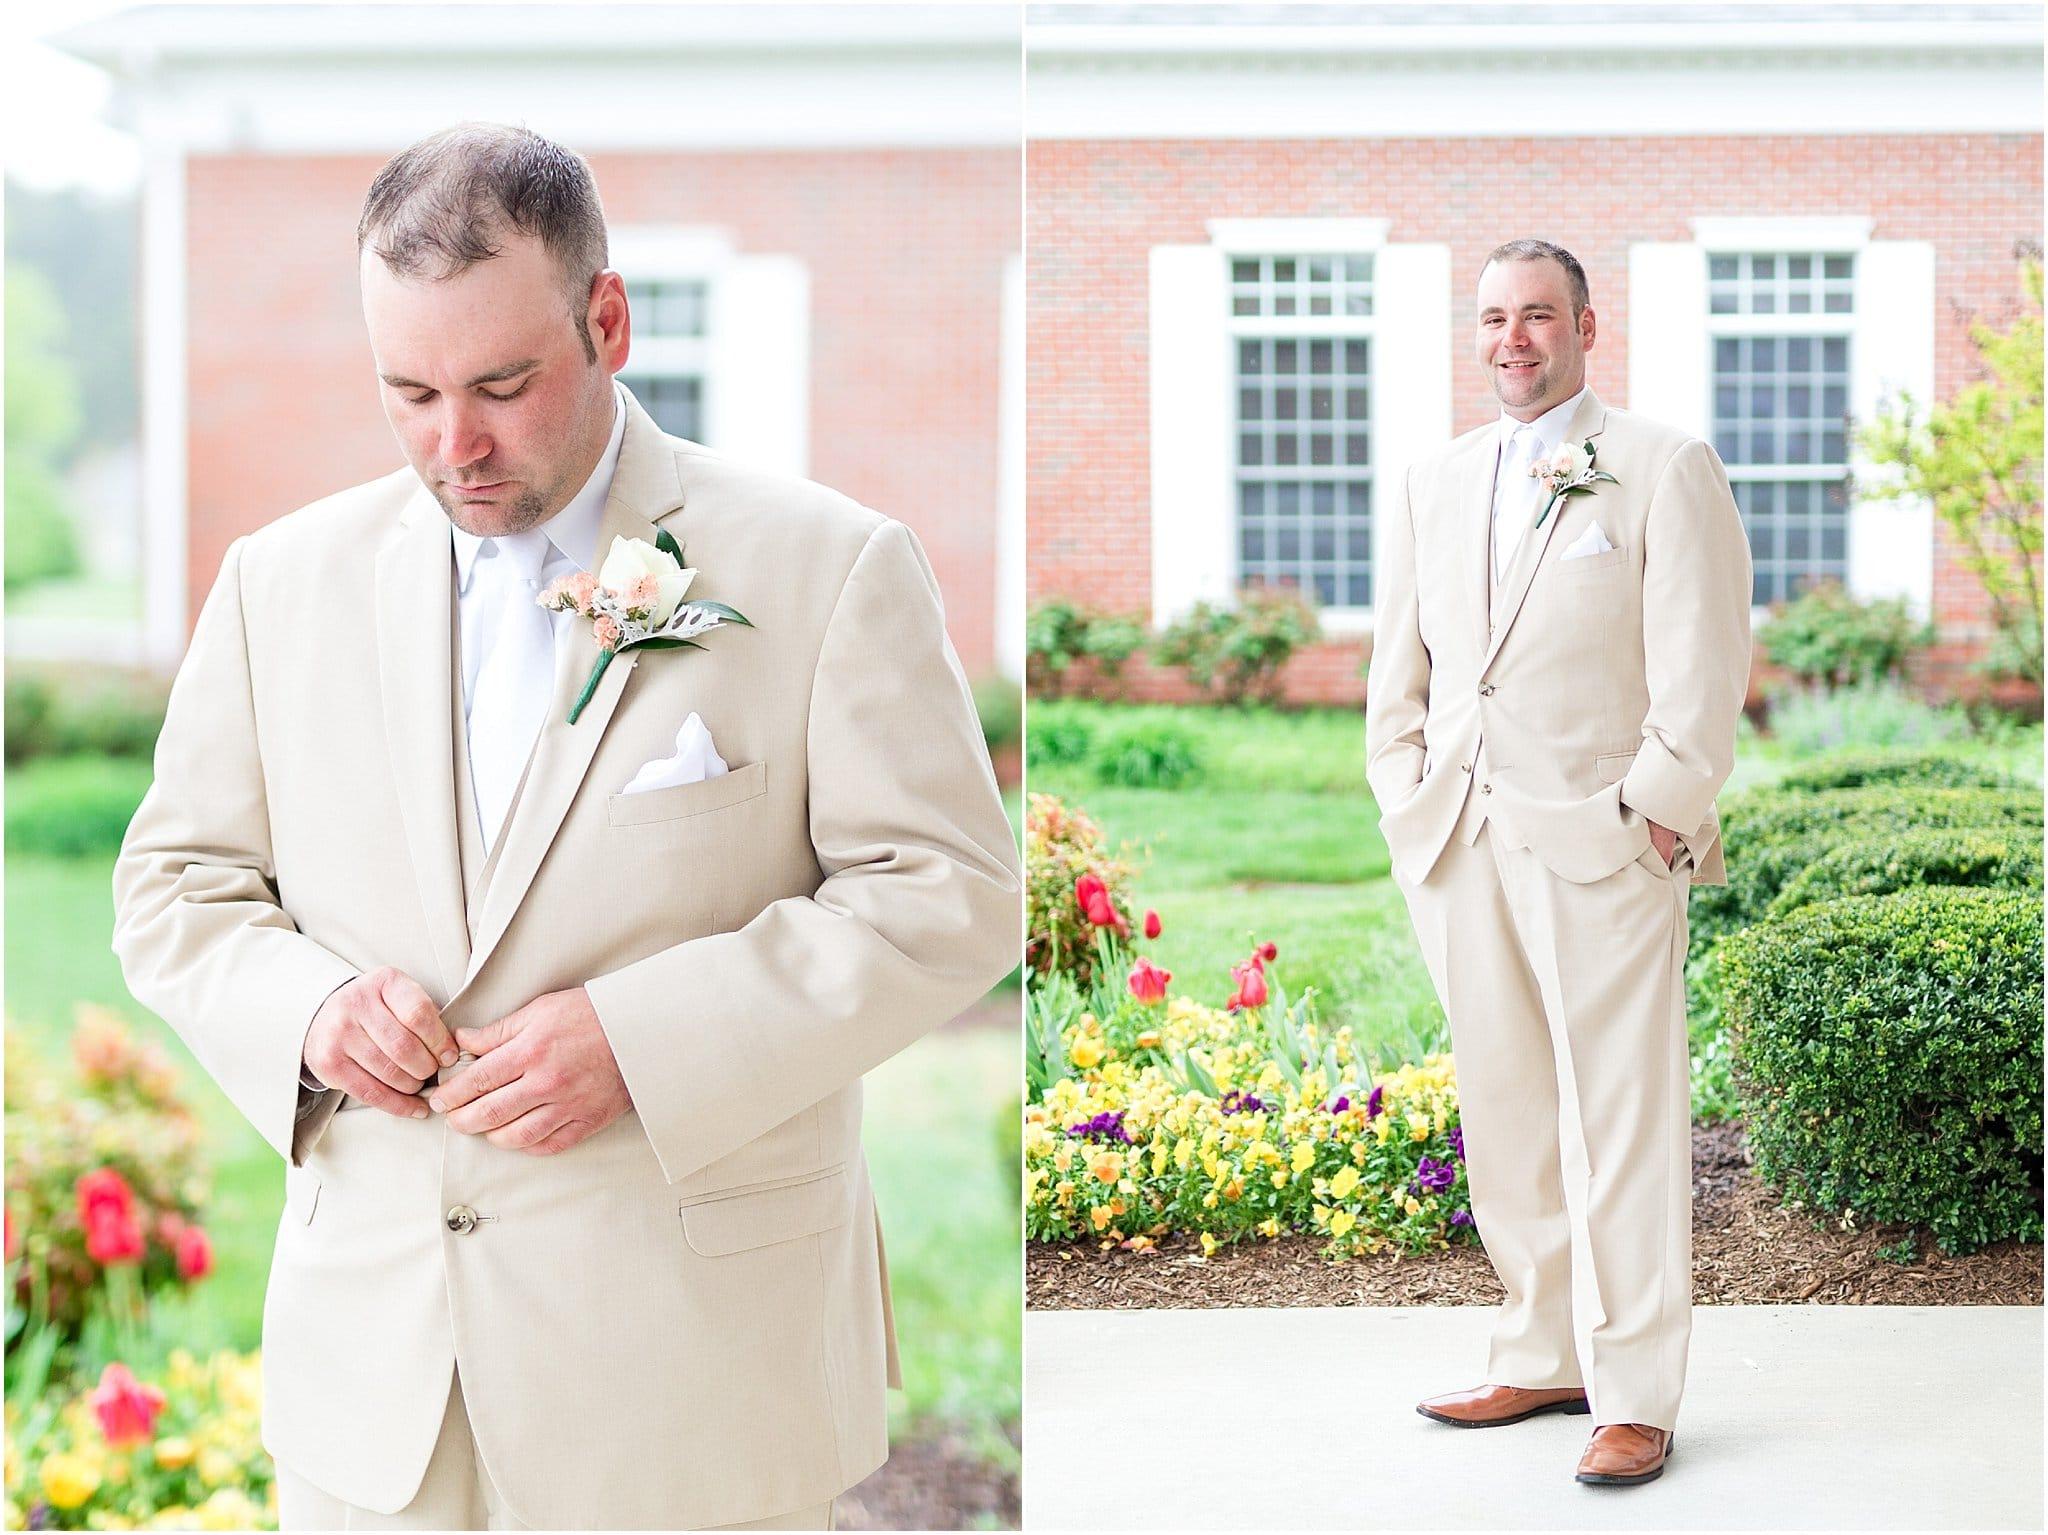 jessscott-milsboro-delaware-wedding-cassidymrphotography_0033